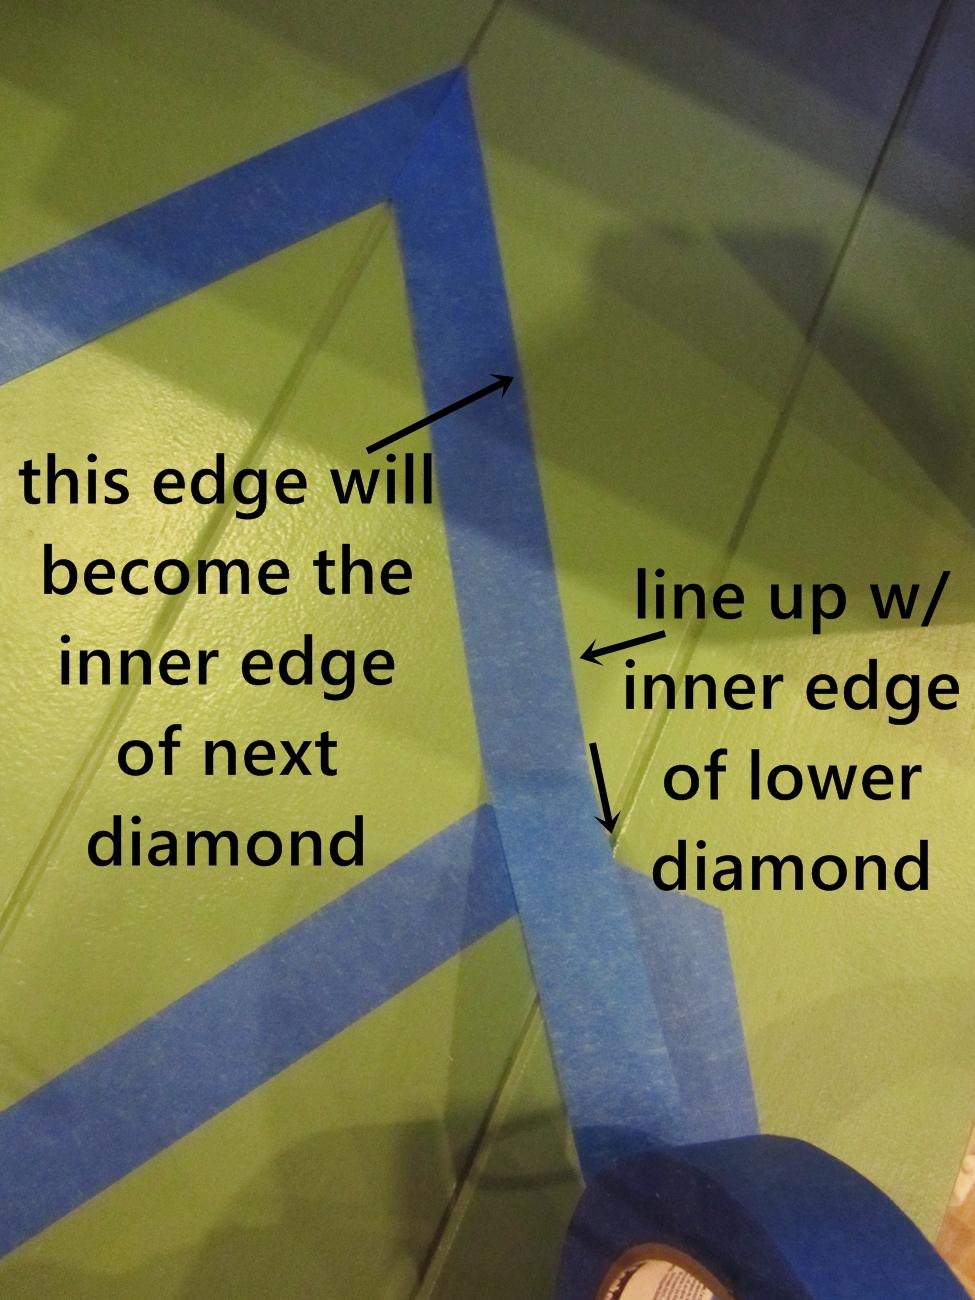 Harlequin Diamond Pattern Painted Furniture